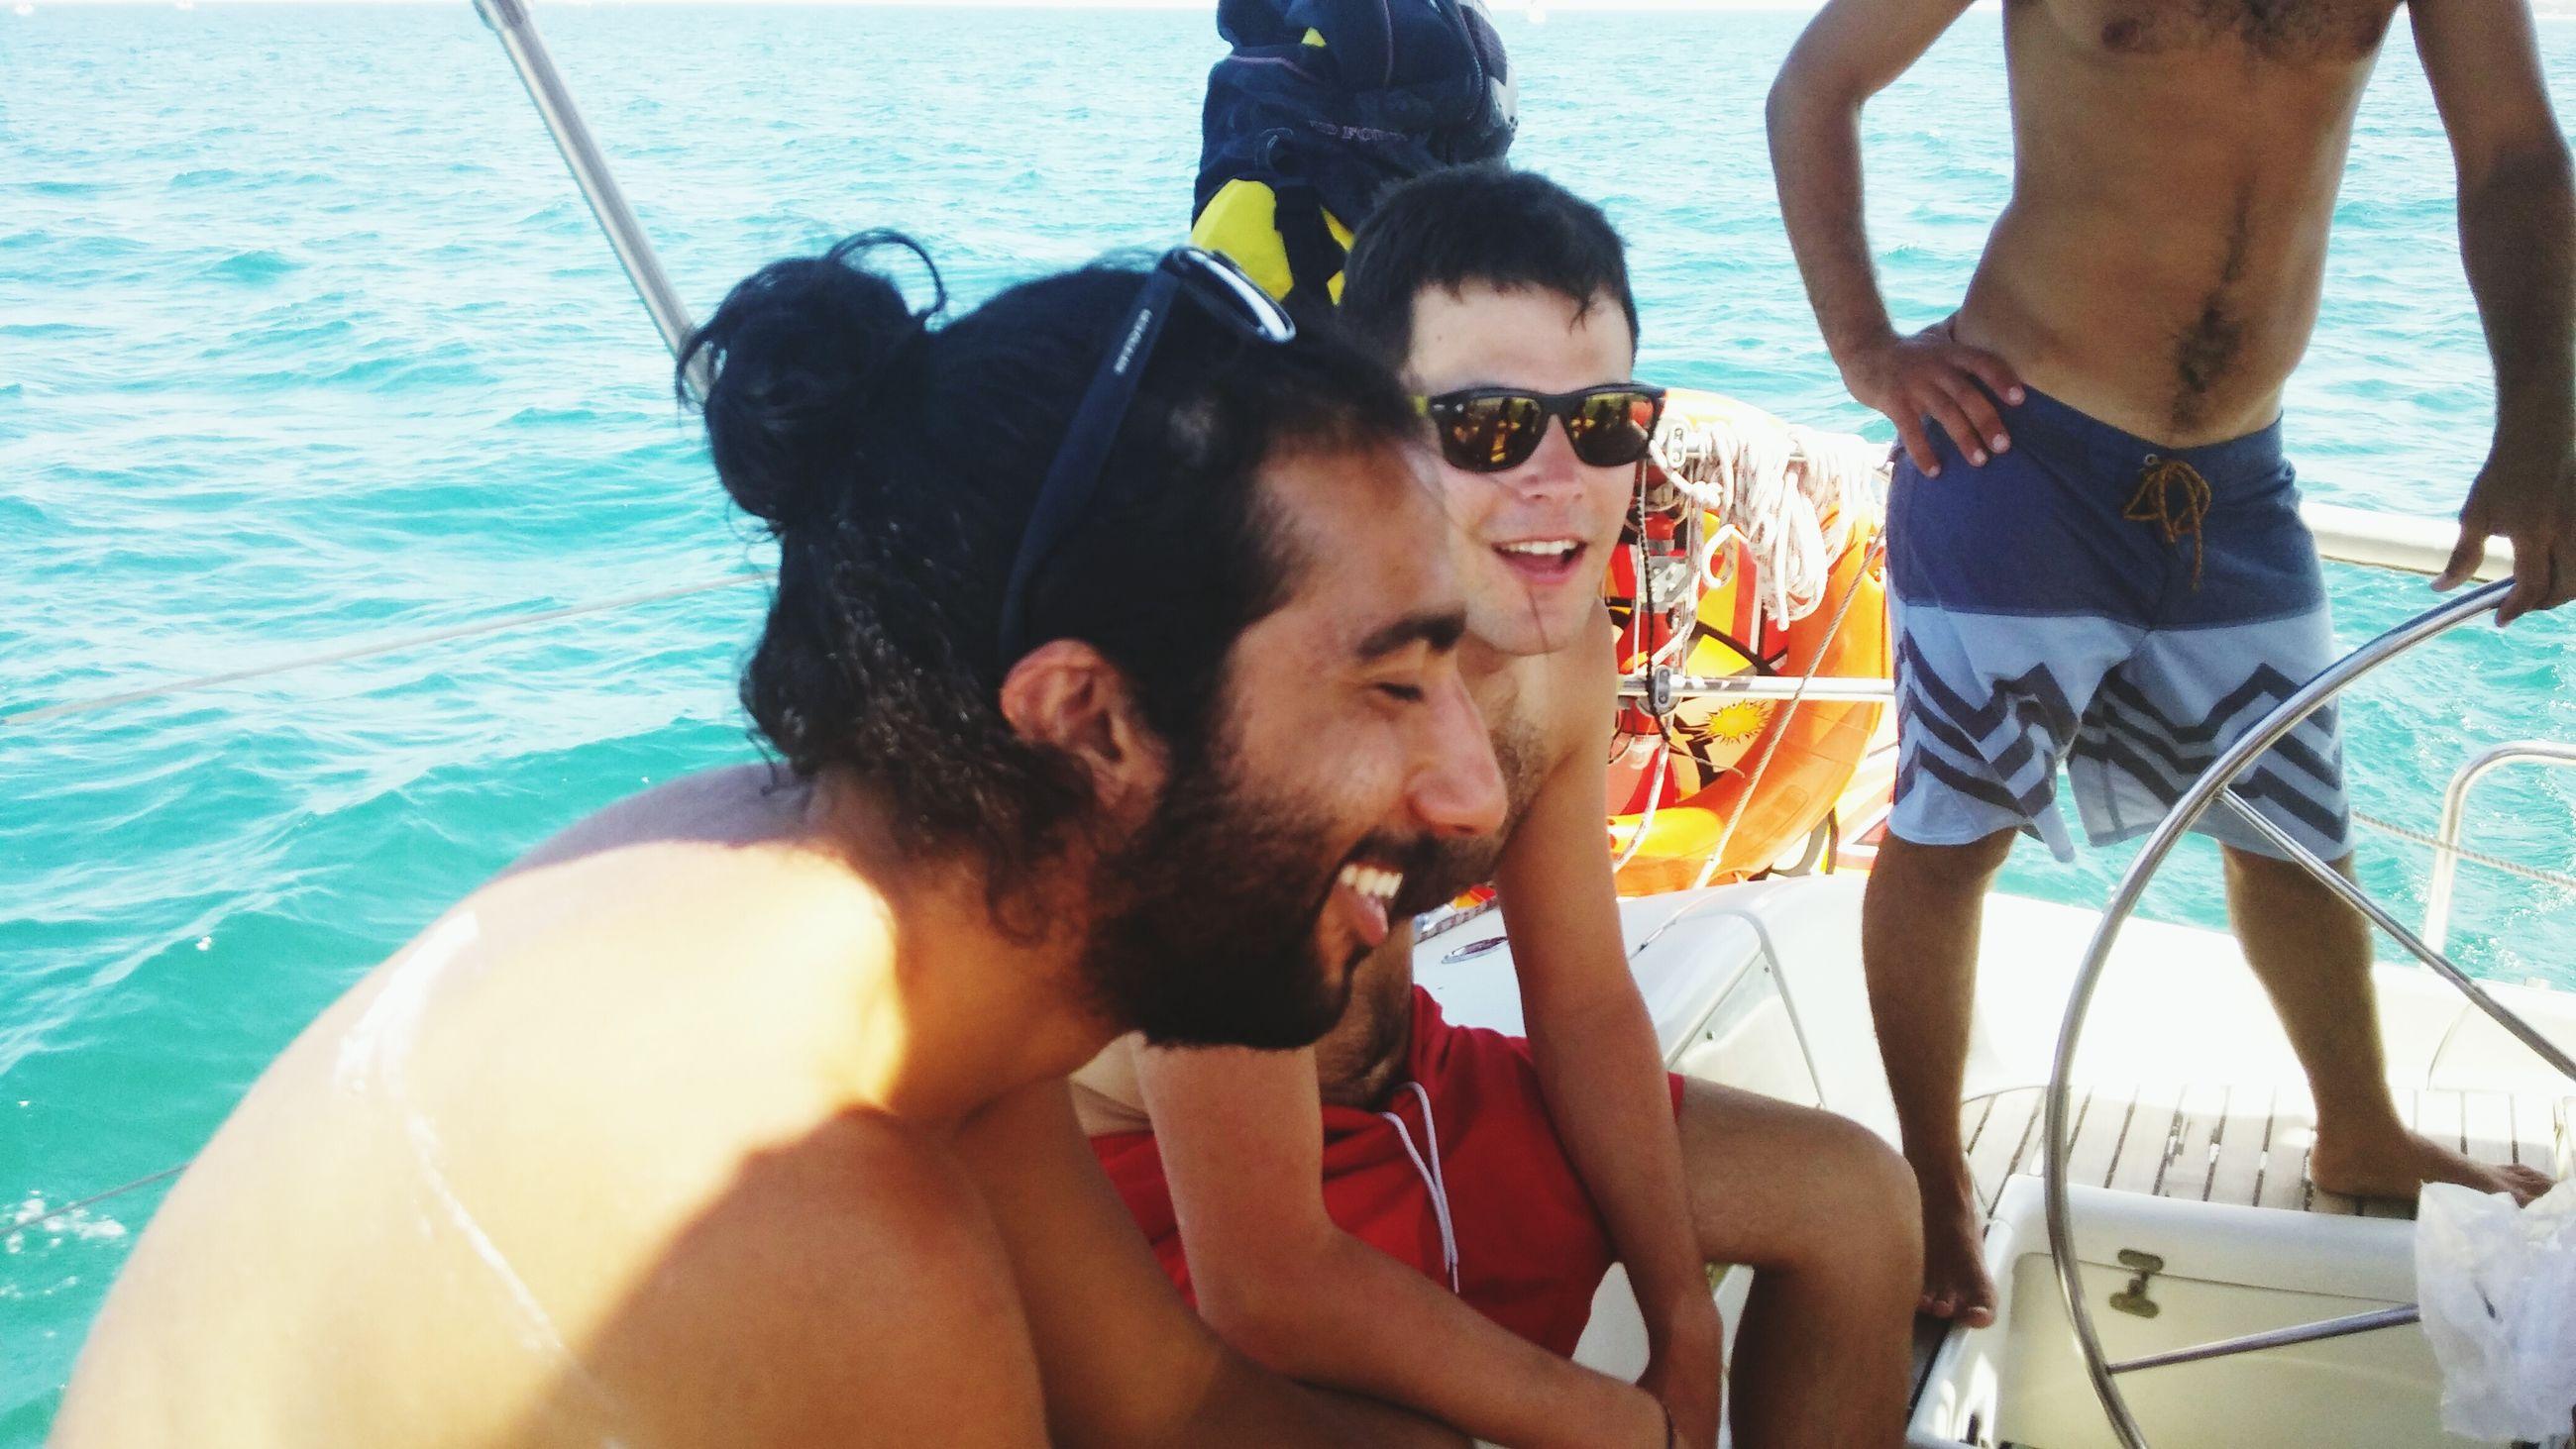 lifestyles, leisure activity, water, togetherness, men, bonding, transportation, friendship, sea, love, mode of transport, nautical vessel, vacations, enjoyment, sitting, person, travel, fun